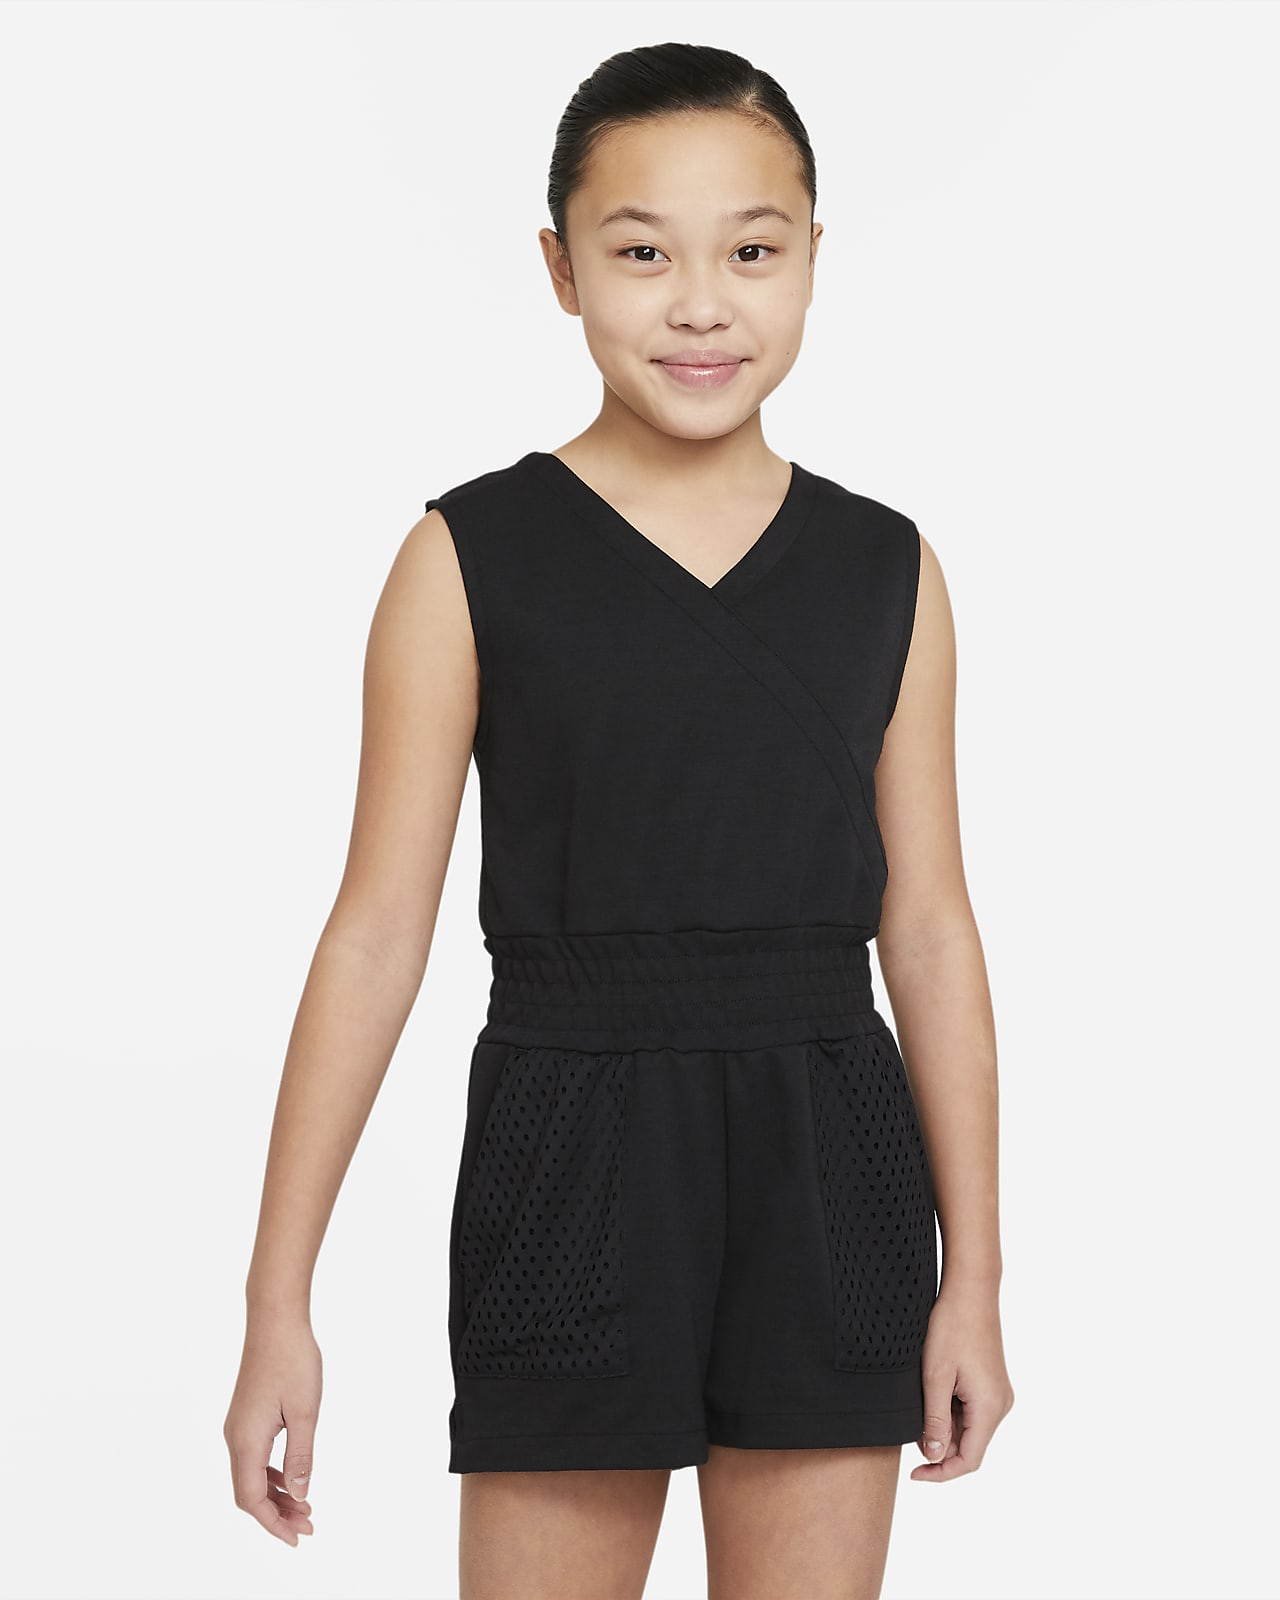 Nike Dri-FIT Older Kids' (Girls') Training Romper